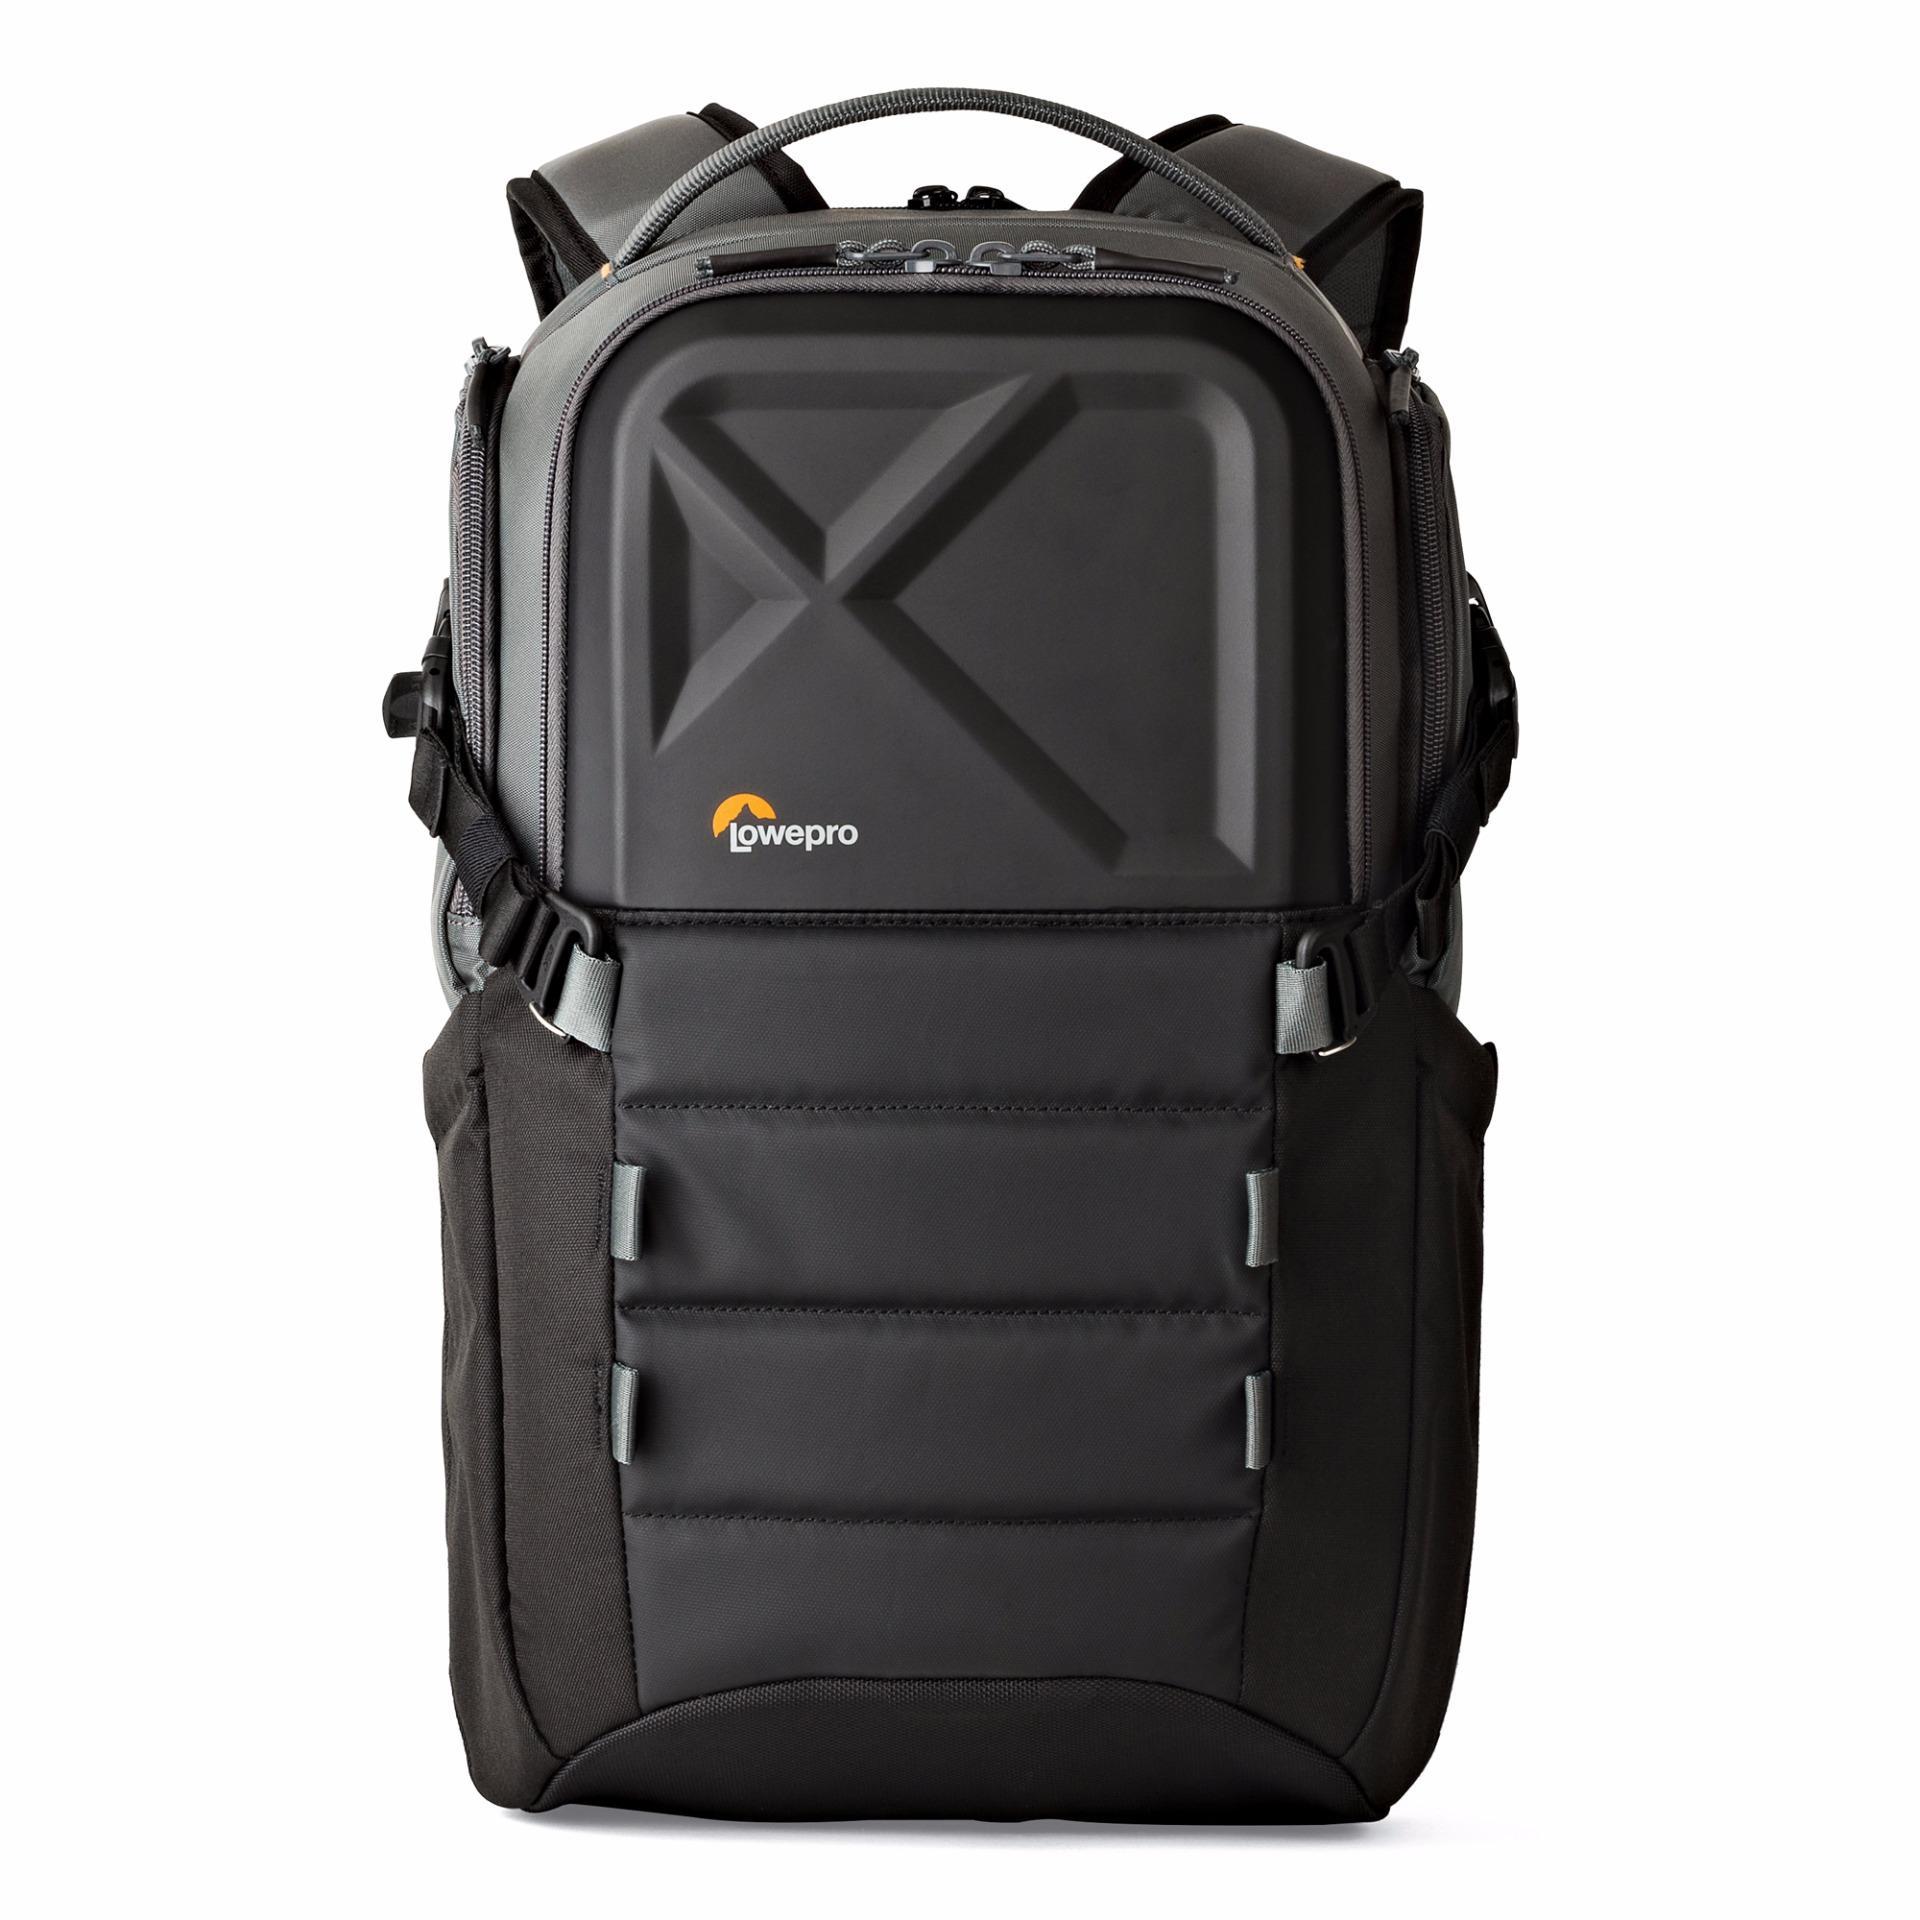 Lowepro QuadGuard BP X1 Racing Drone Backpack